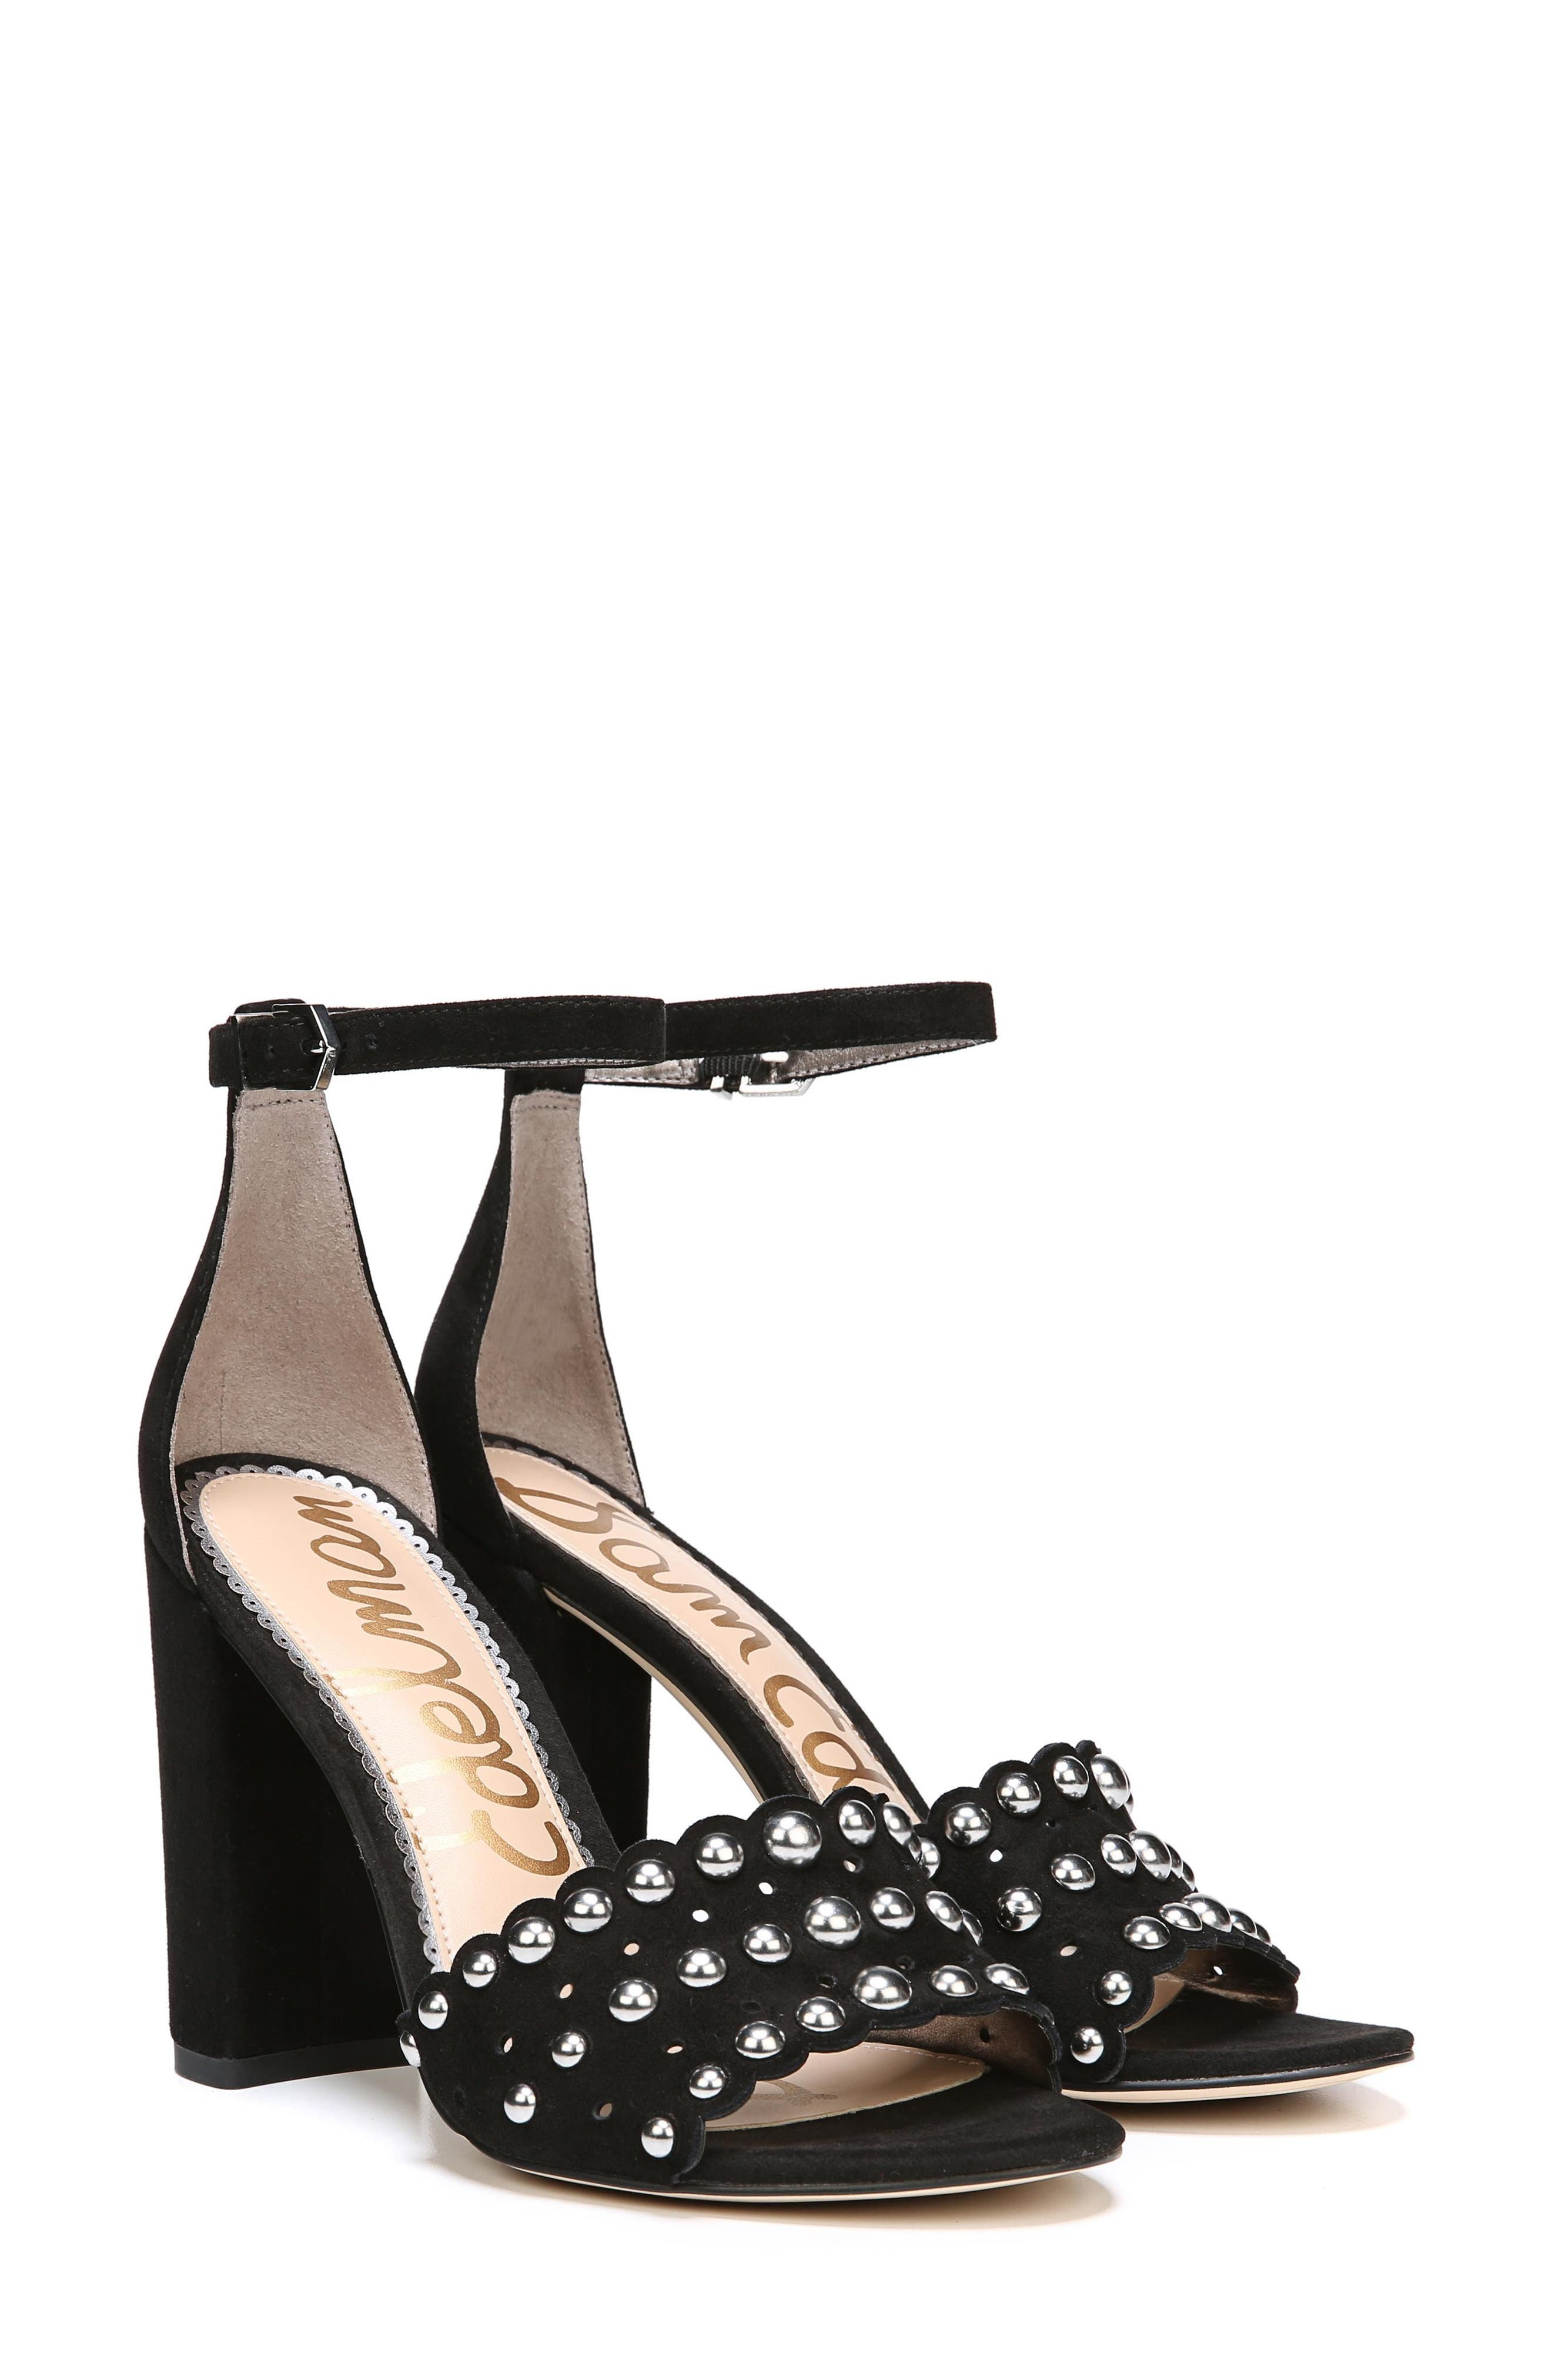 Yaria Studded Block Heel Sandal,                             Main thumbnail 1, color,                             001